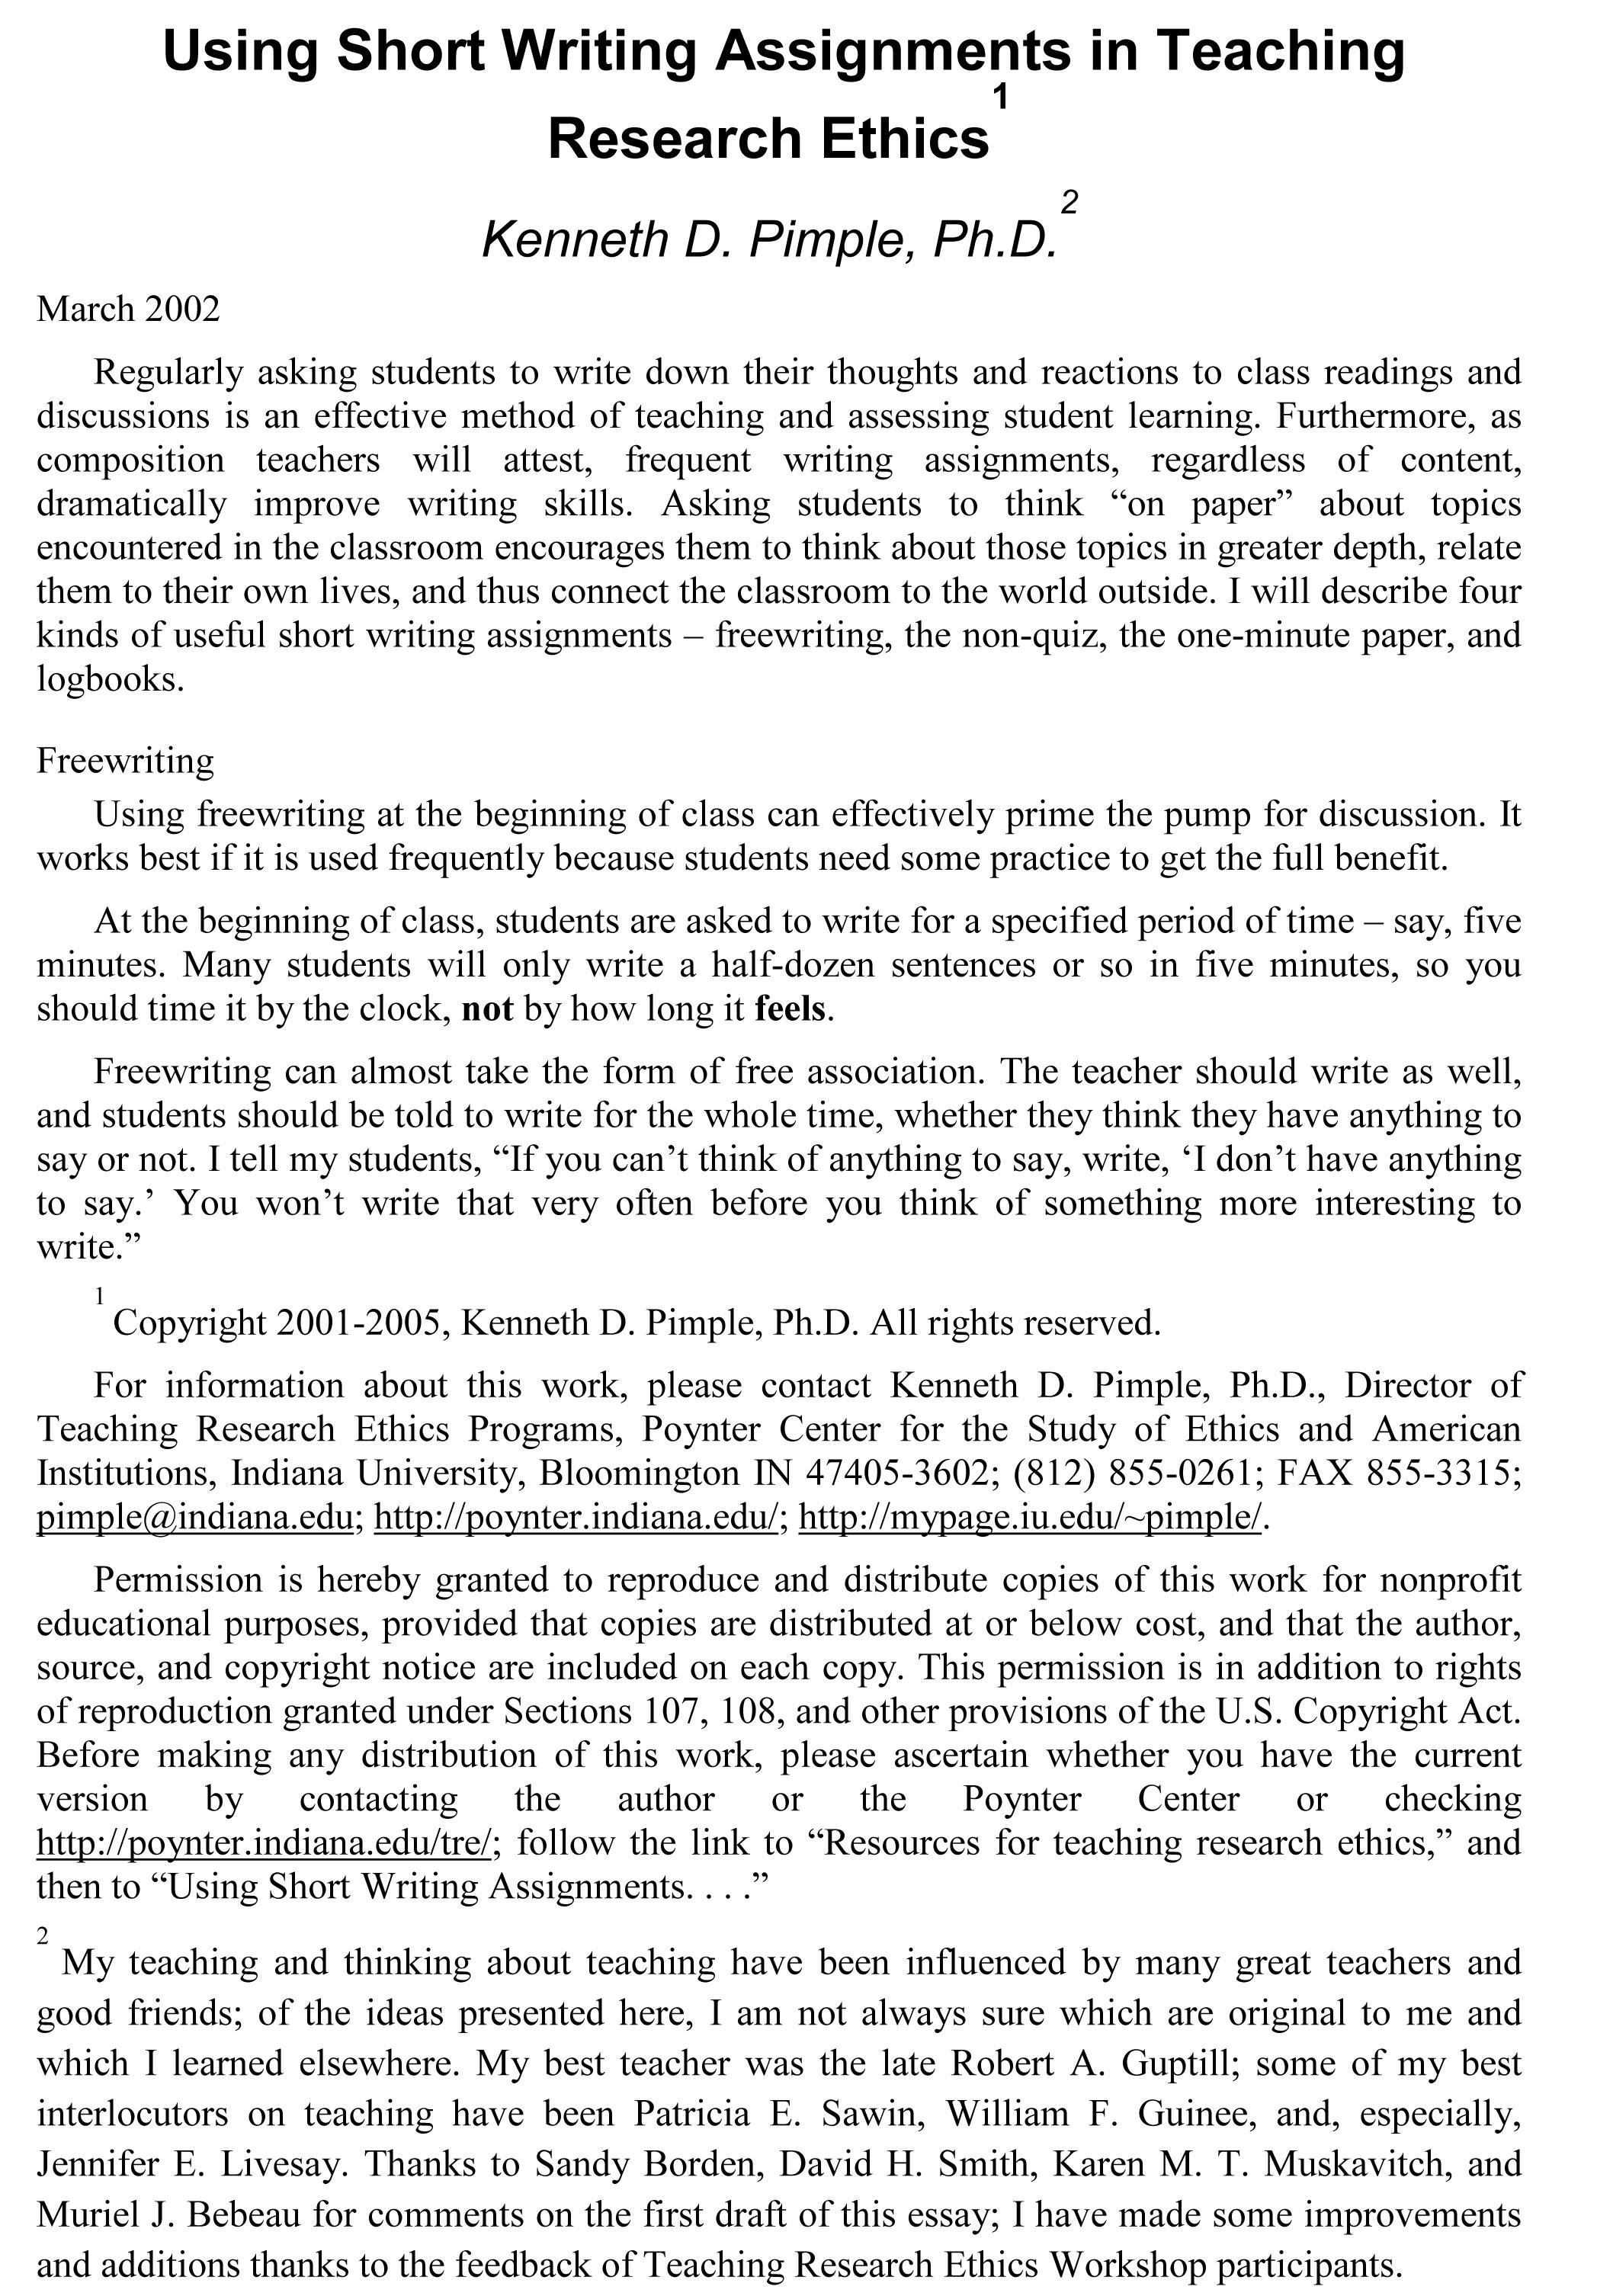 003 Custom College Essays Essay Example Sample Excellent Writing Service Full